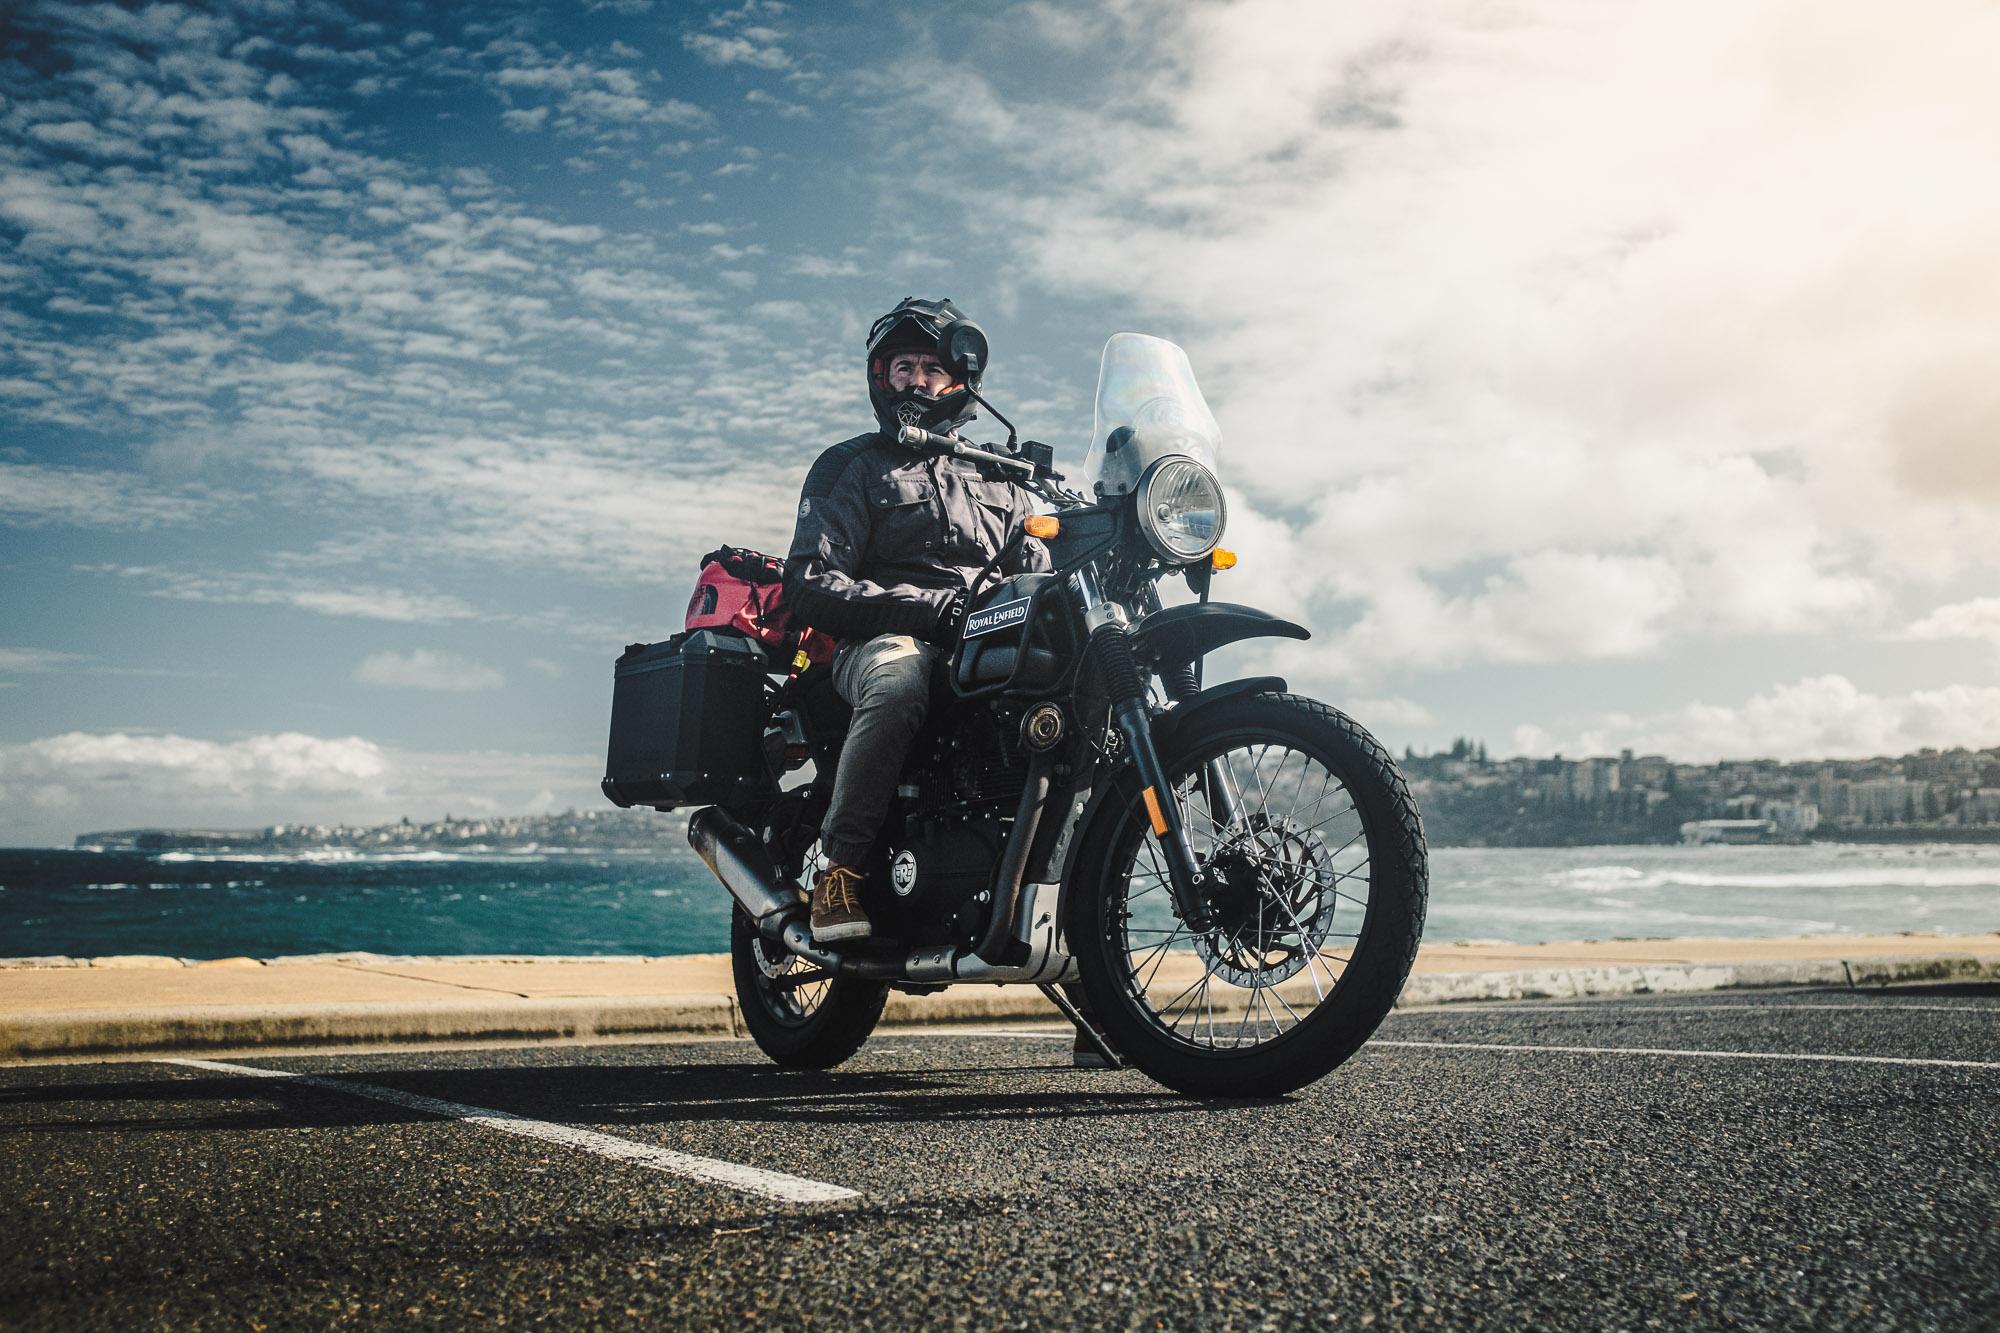 Daniel 'Beardy' McLaughlin on a Royal Enfield Himalayan at Bondi Beach